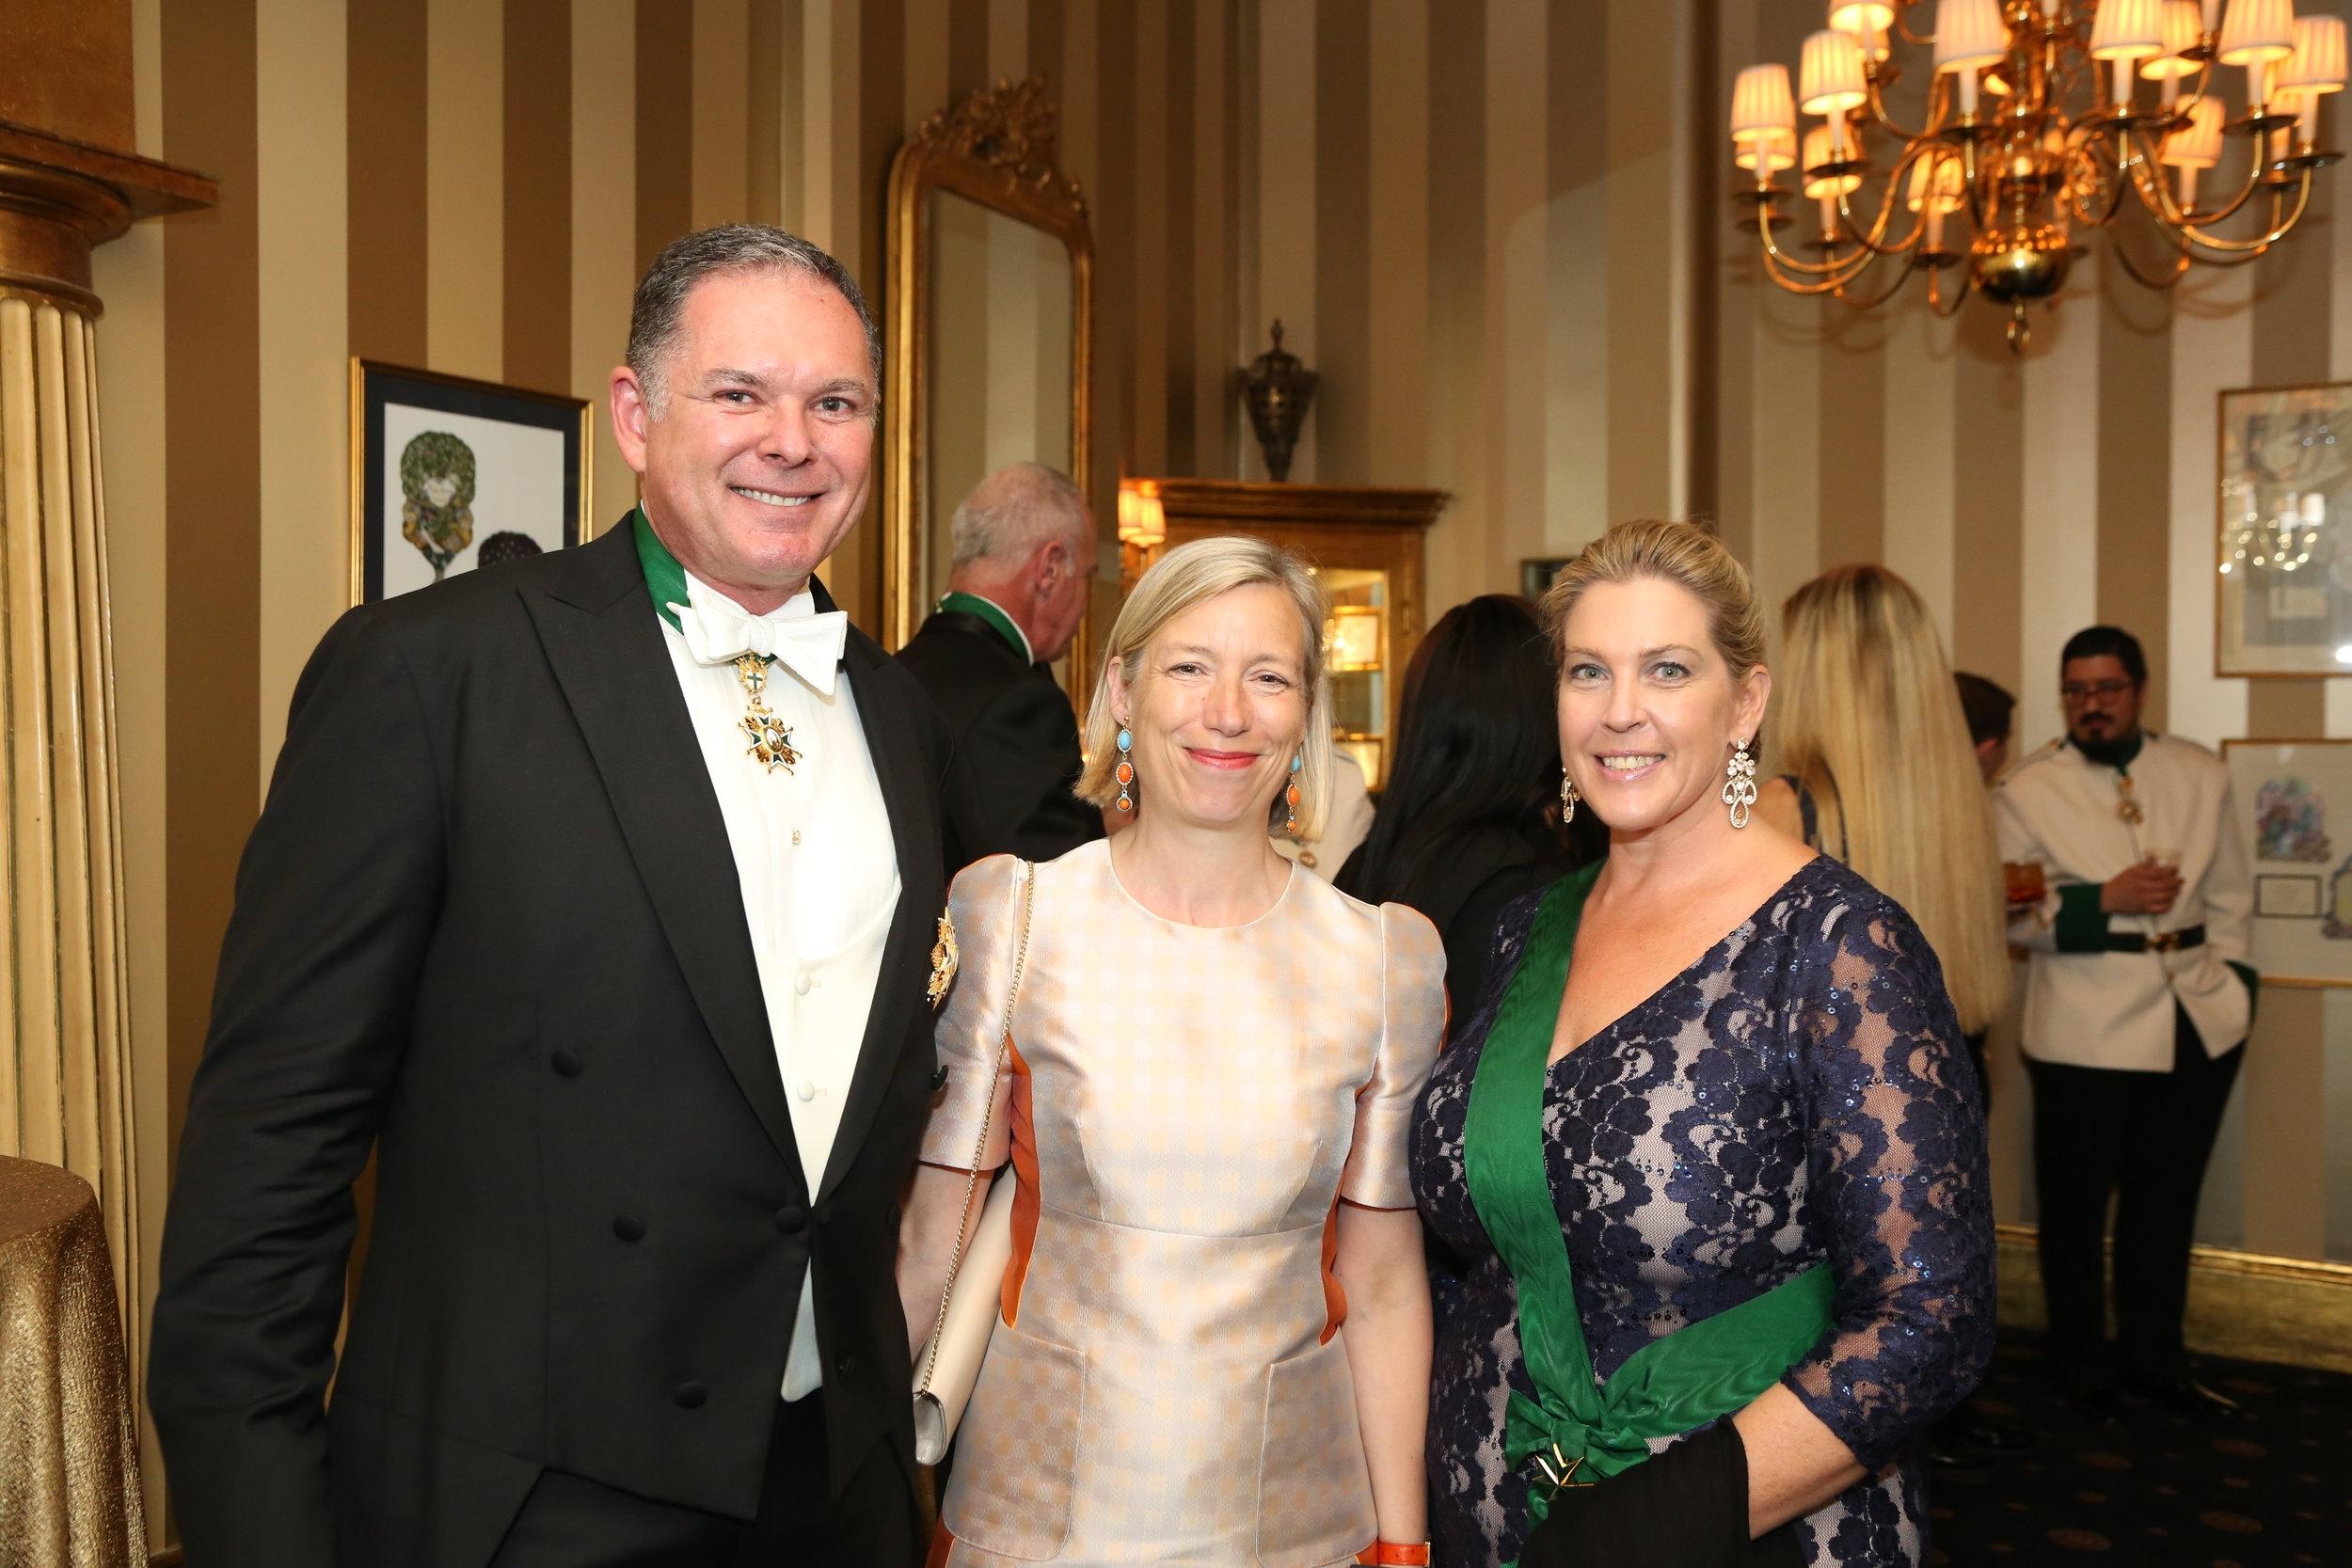 PRINCESS CLOTILDE D'ORLEANS BOURBON FRENCH ROYAL FAMILY